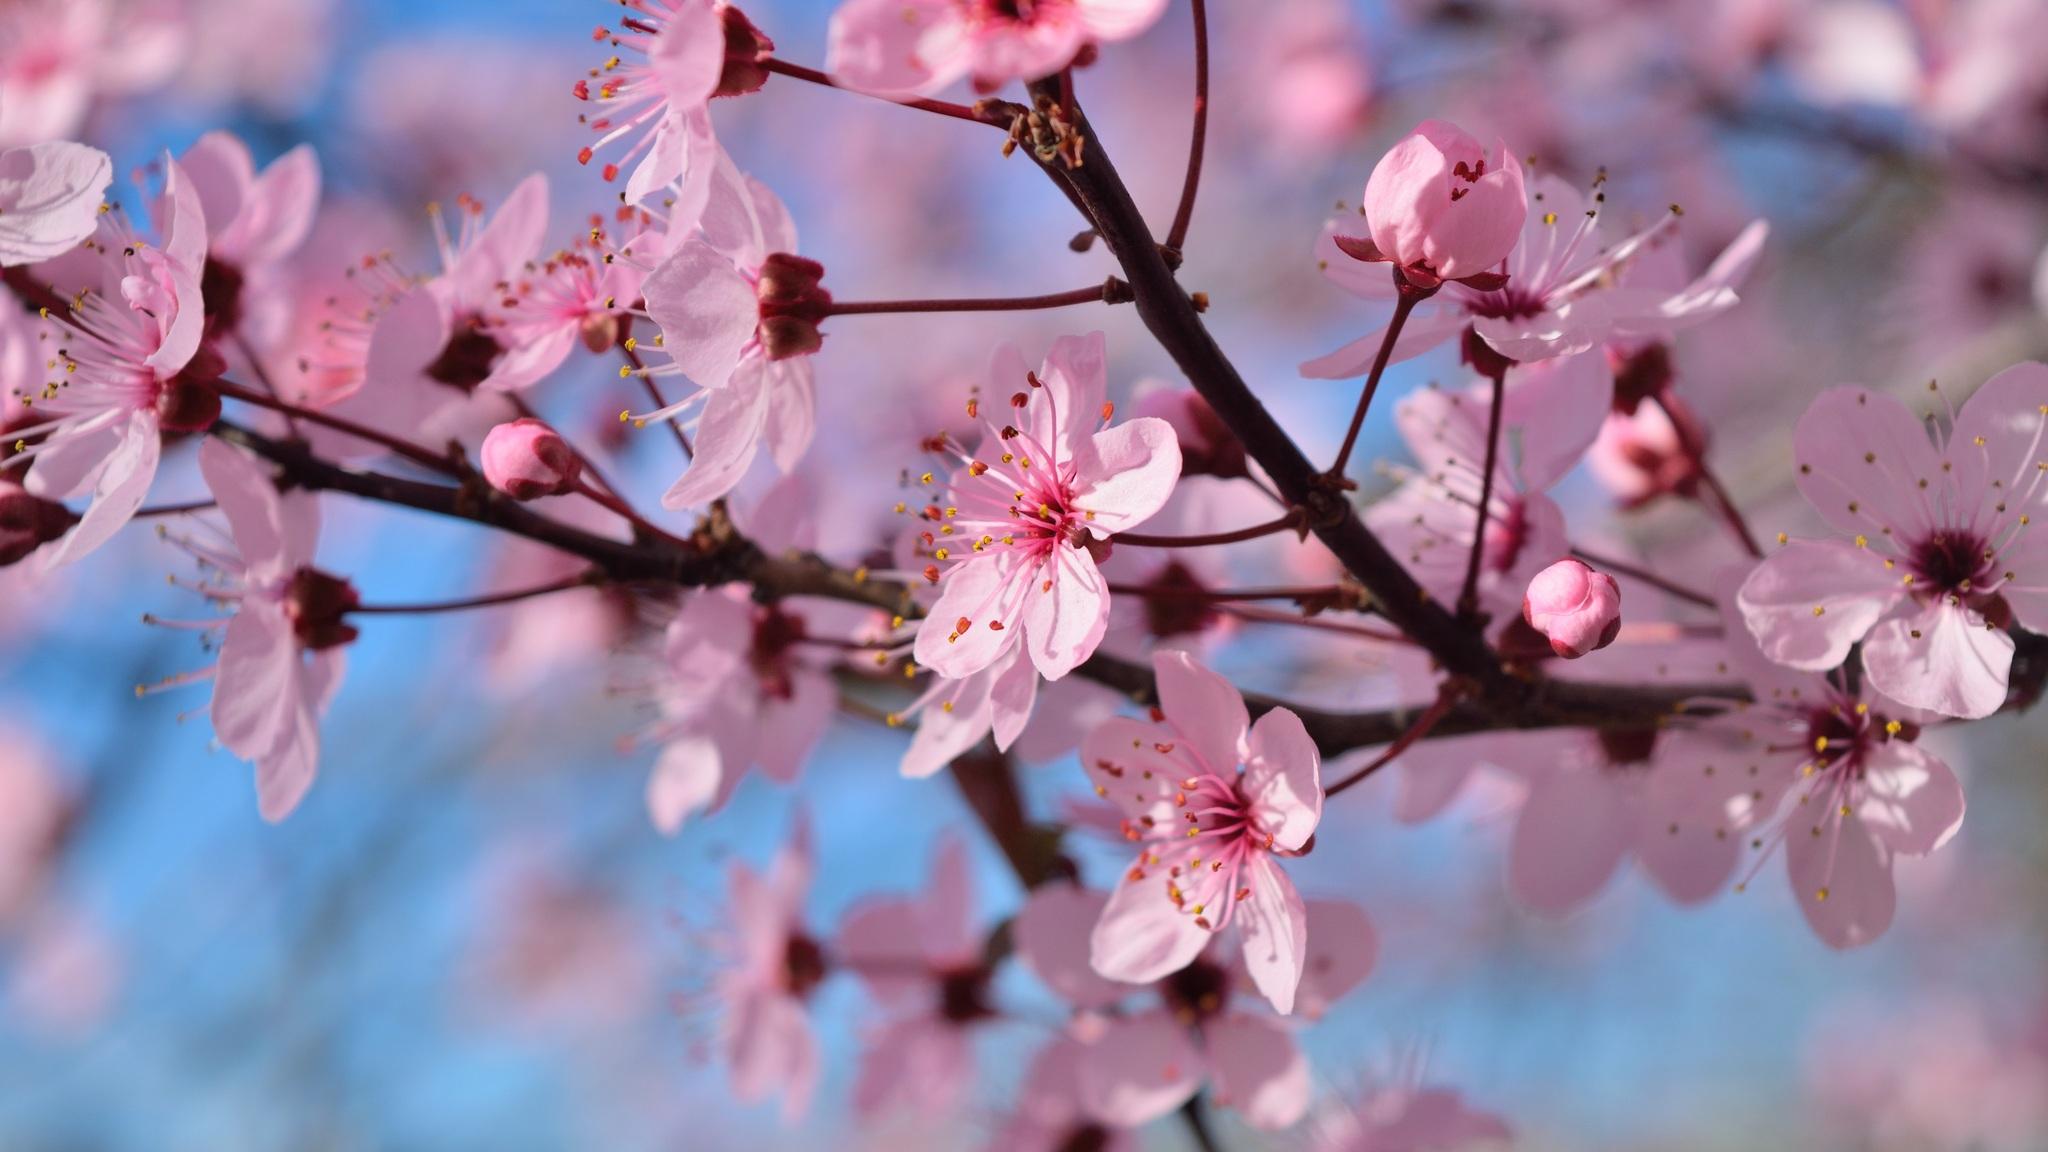 2048x1152 spring season flowers 2048x1152 resolution hd 4k spring season flowers osg mightylinksfo